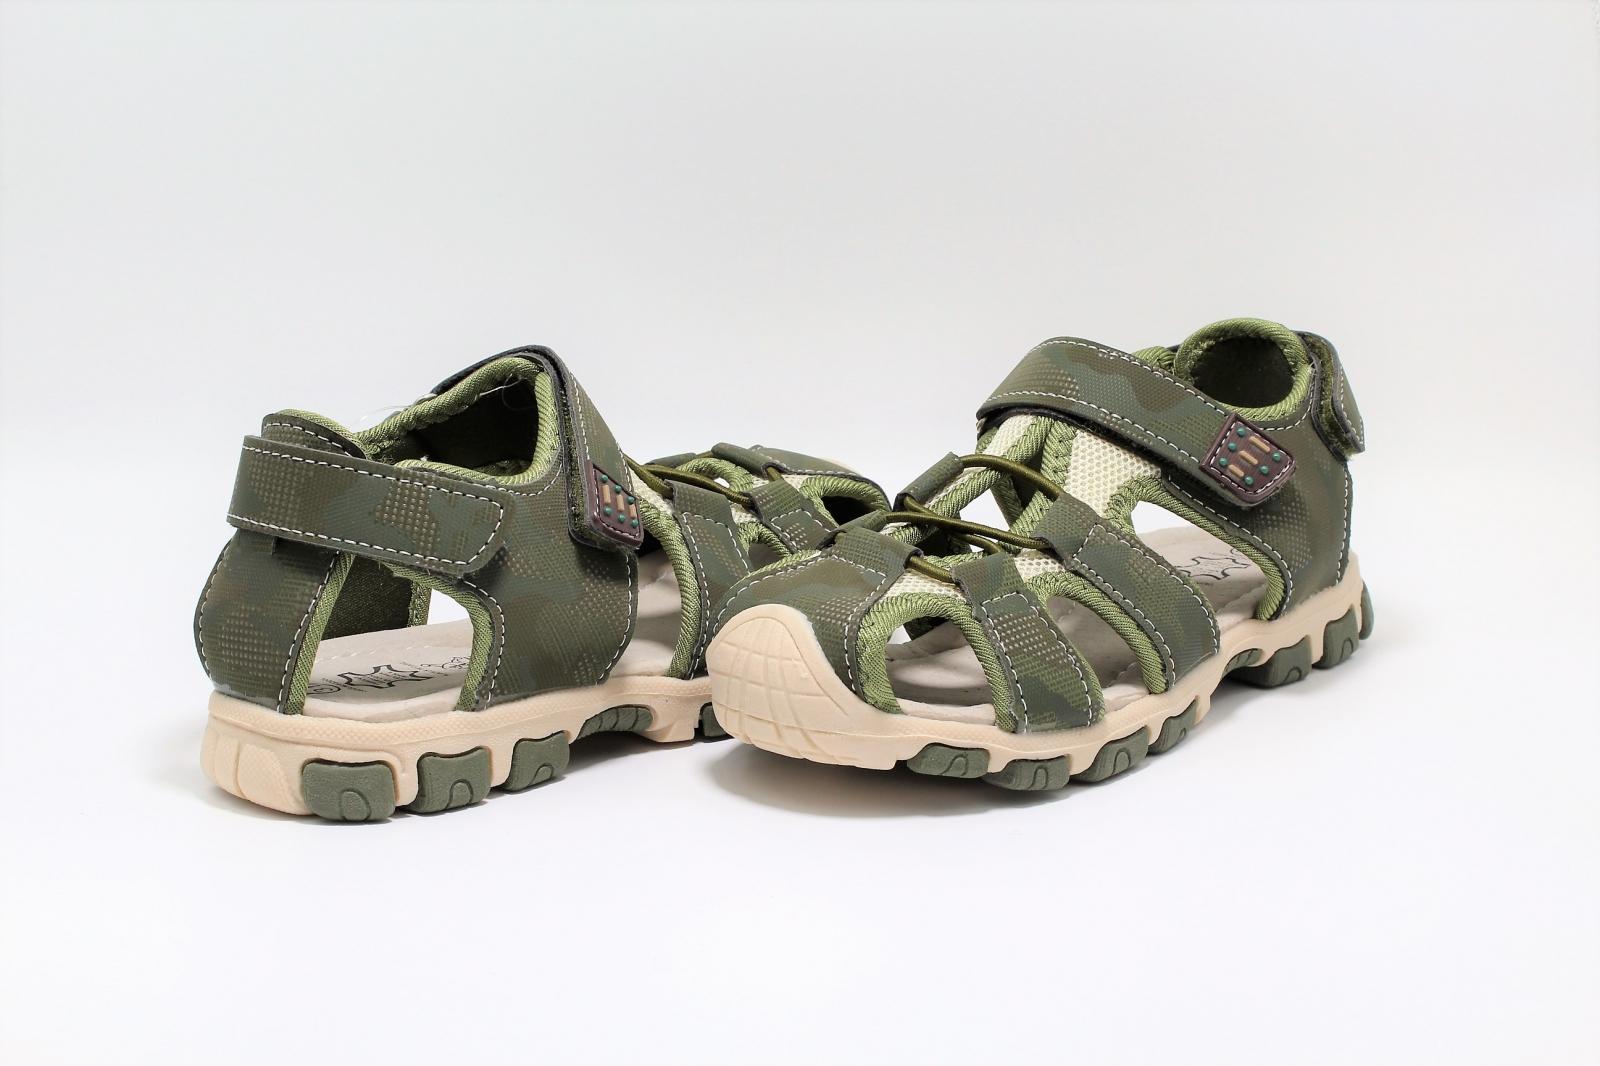 vânzare cu reduceri super calitate pret de fabrica Sandale baieti Army Camuflaj DGN piele si material textil ...